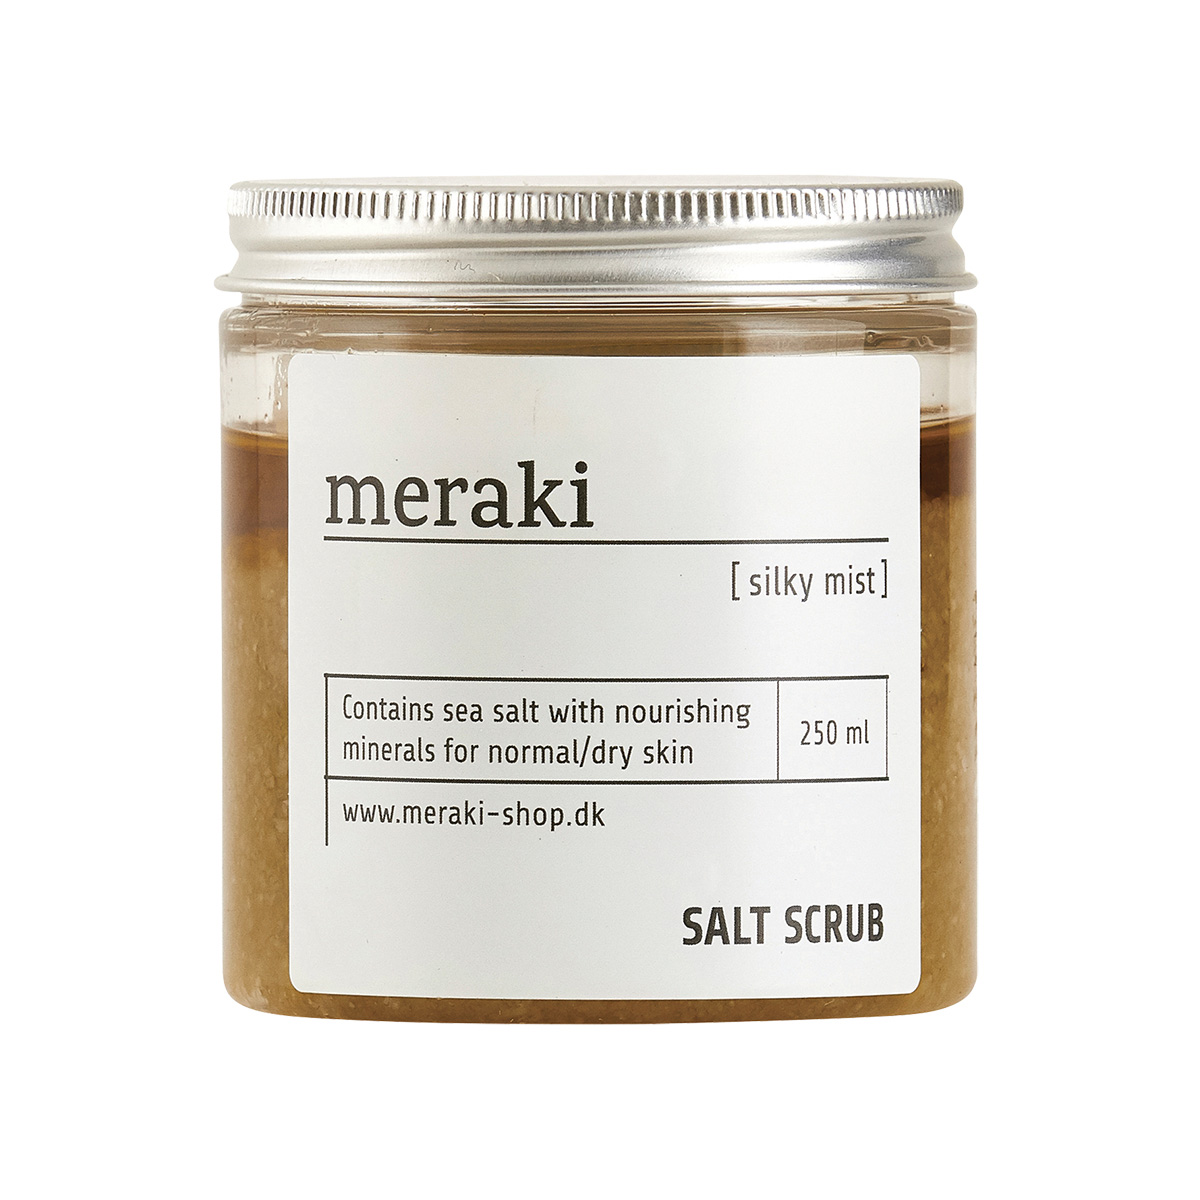 MERAKI SALZ PEELING SALT SCRUB SILKY MIST